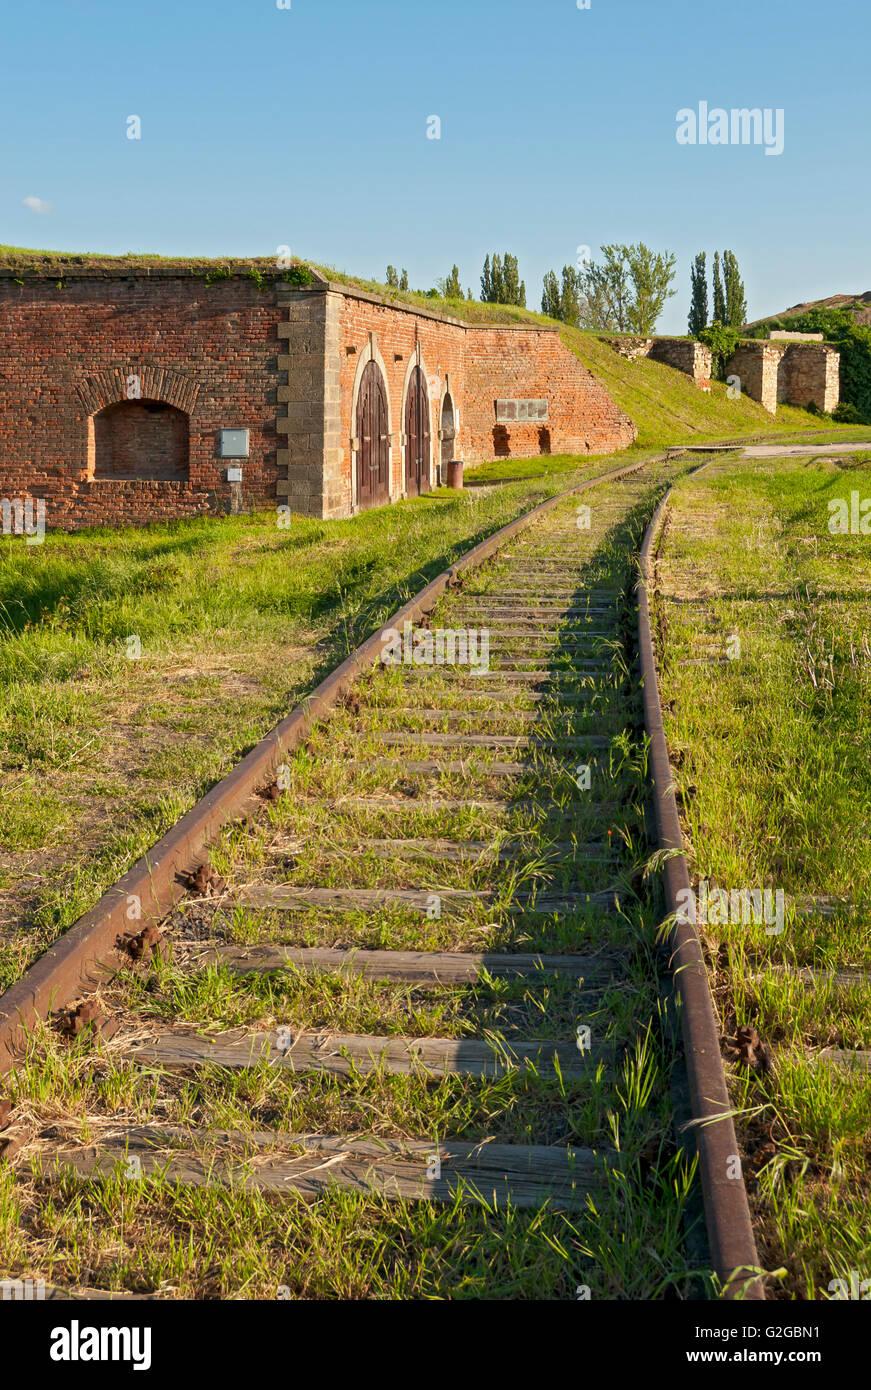 Rail track near the funeral rooms, Terezin Memorial, Terezín, Ústí nad Labem Region, Czech Republic - Stock Image